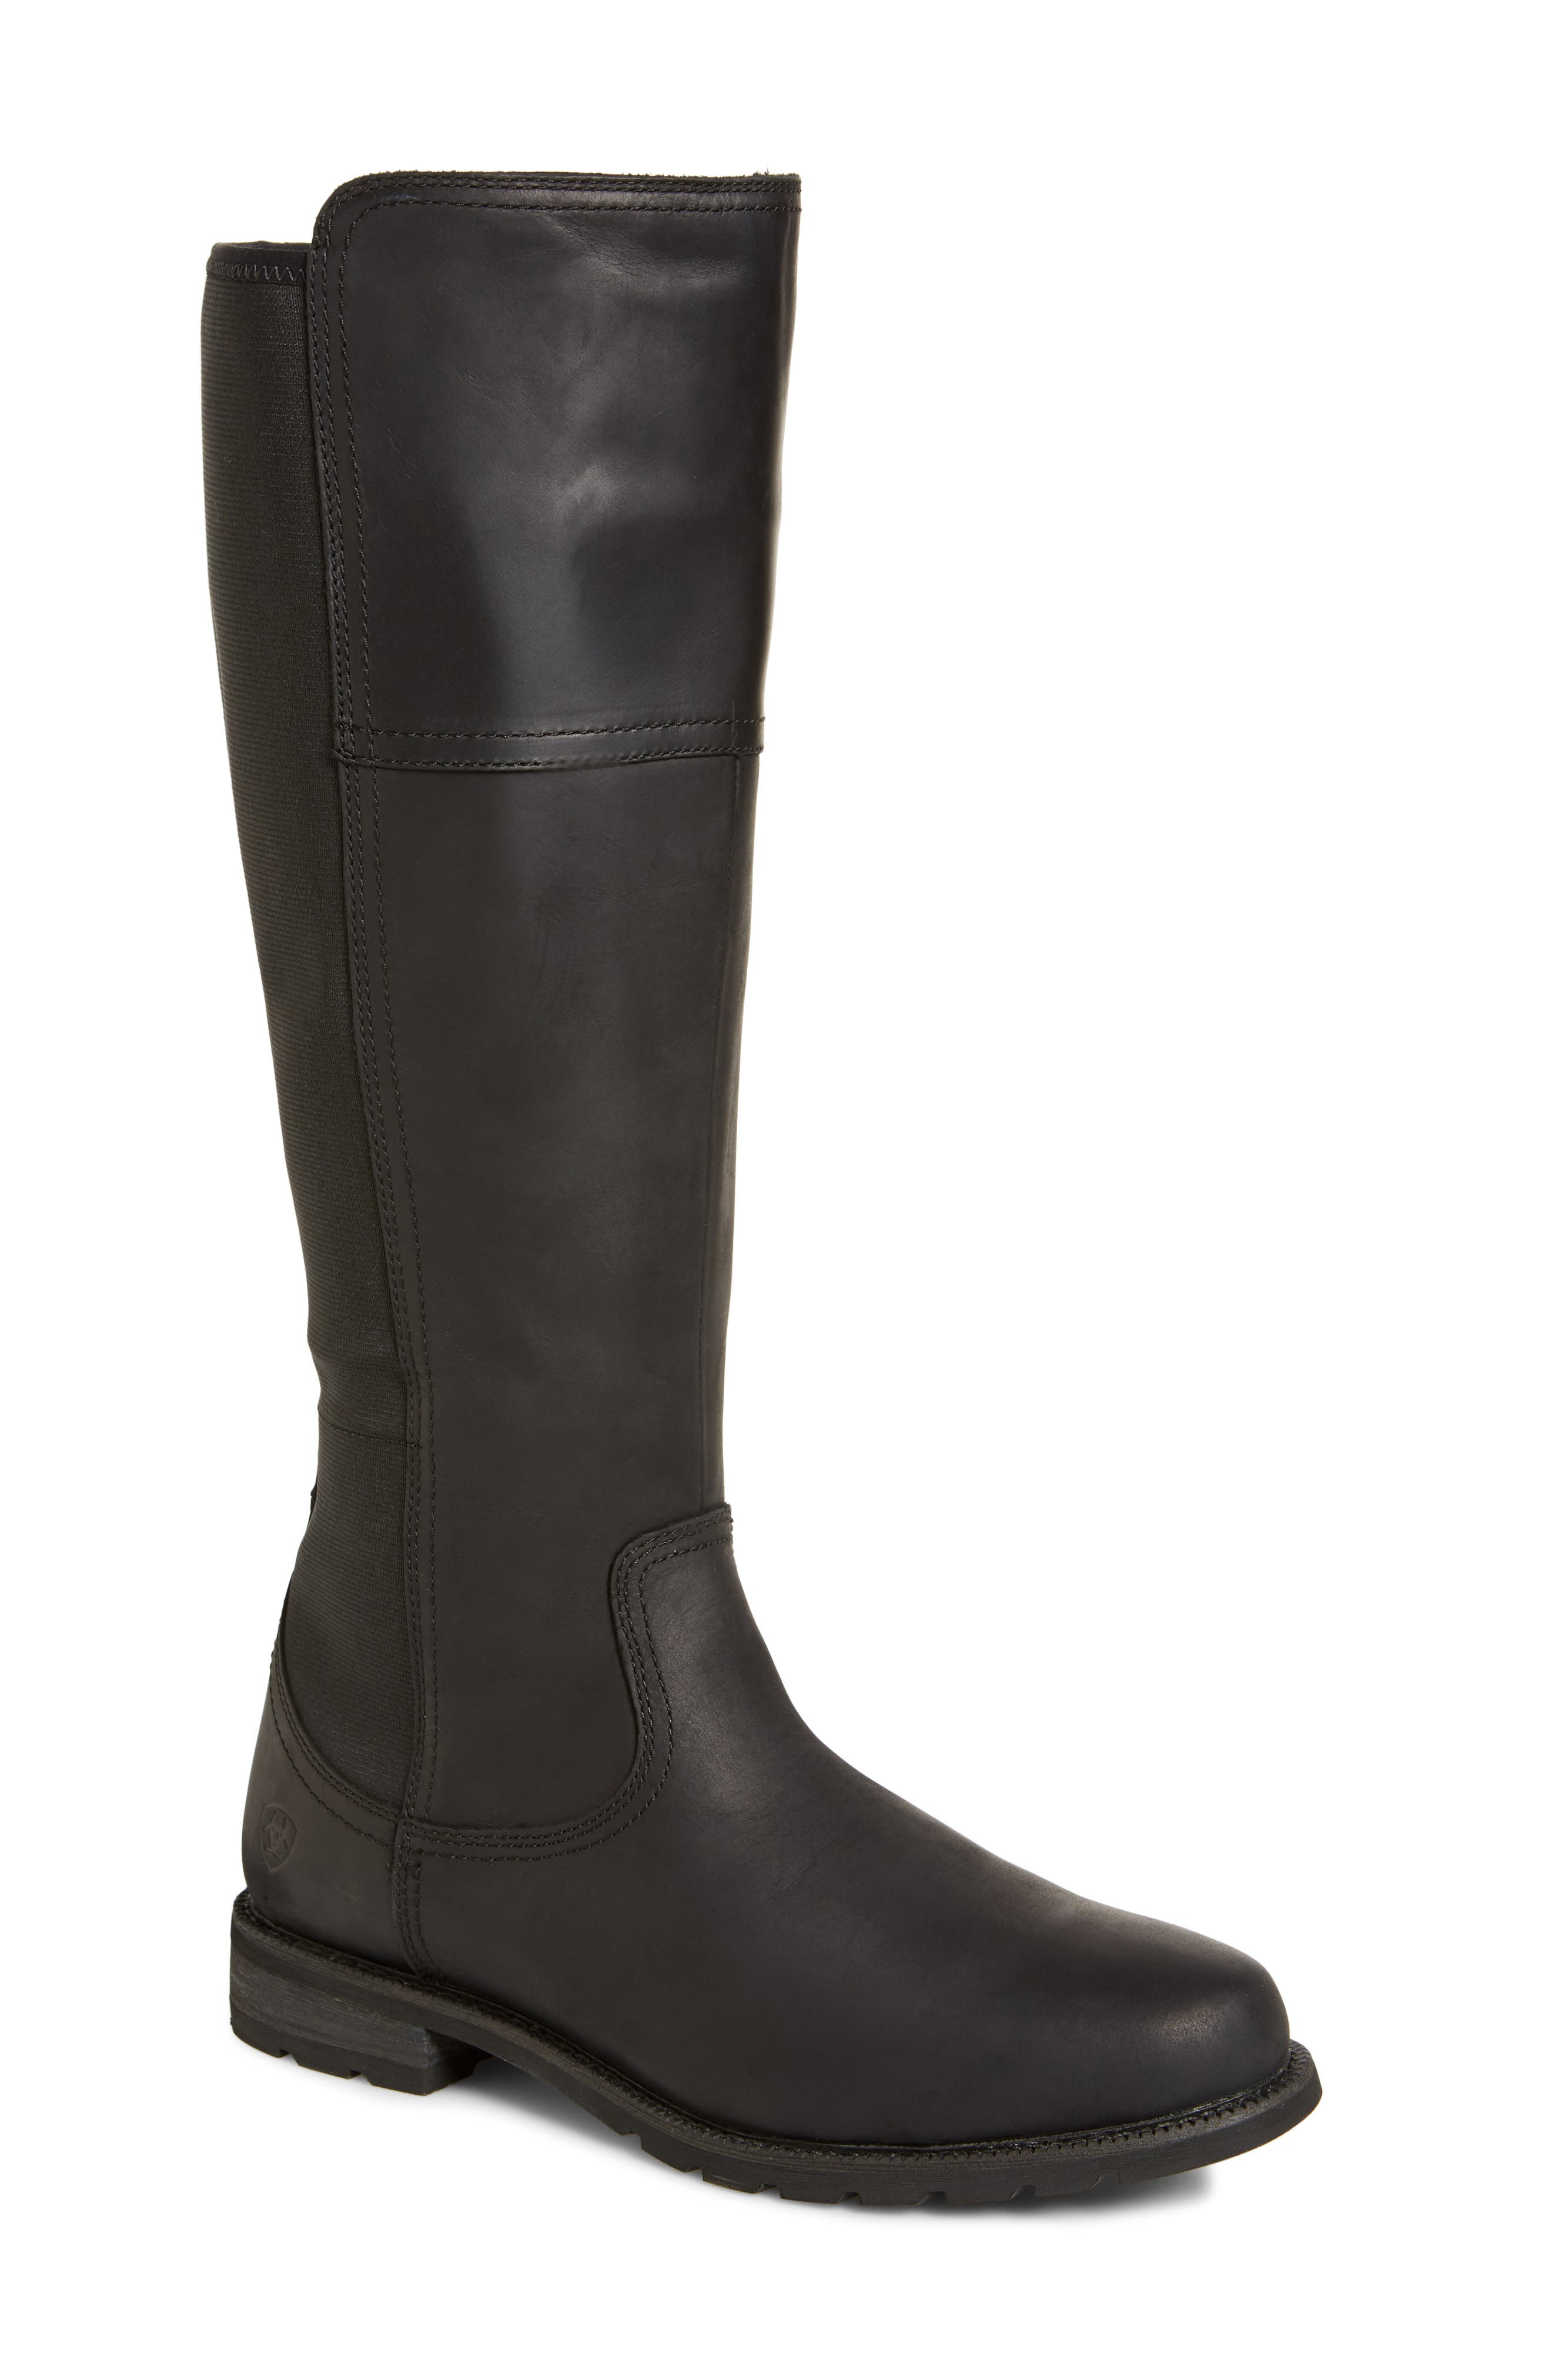 Ariat Sutton Waterproof Tall Boot- Black